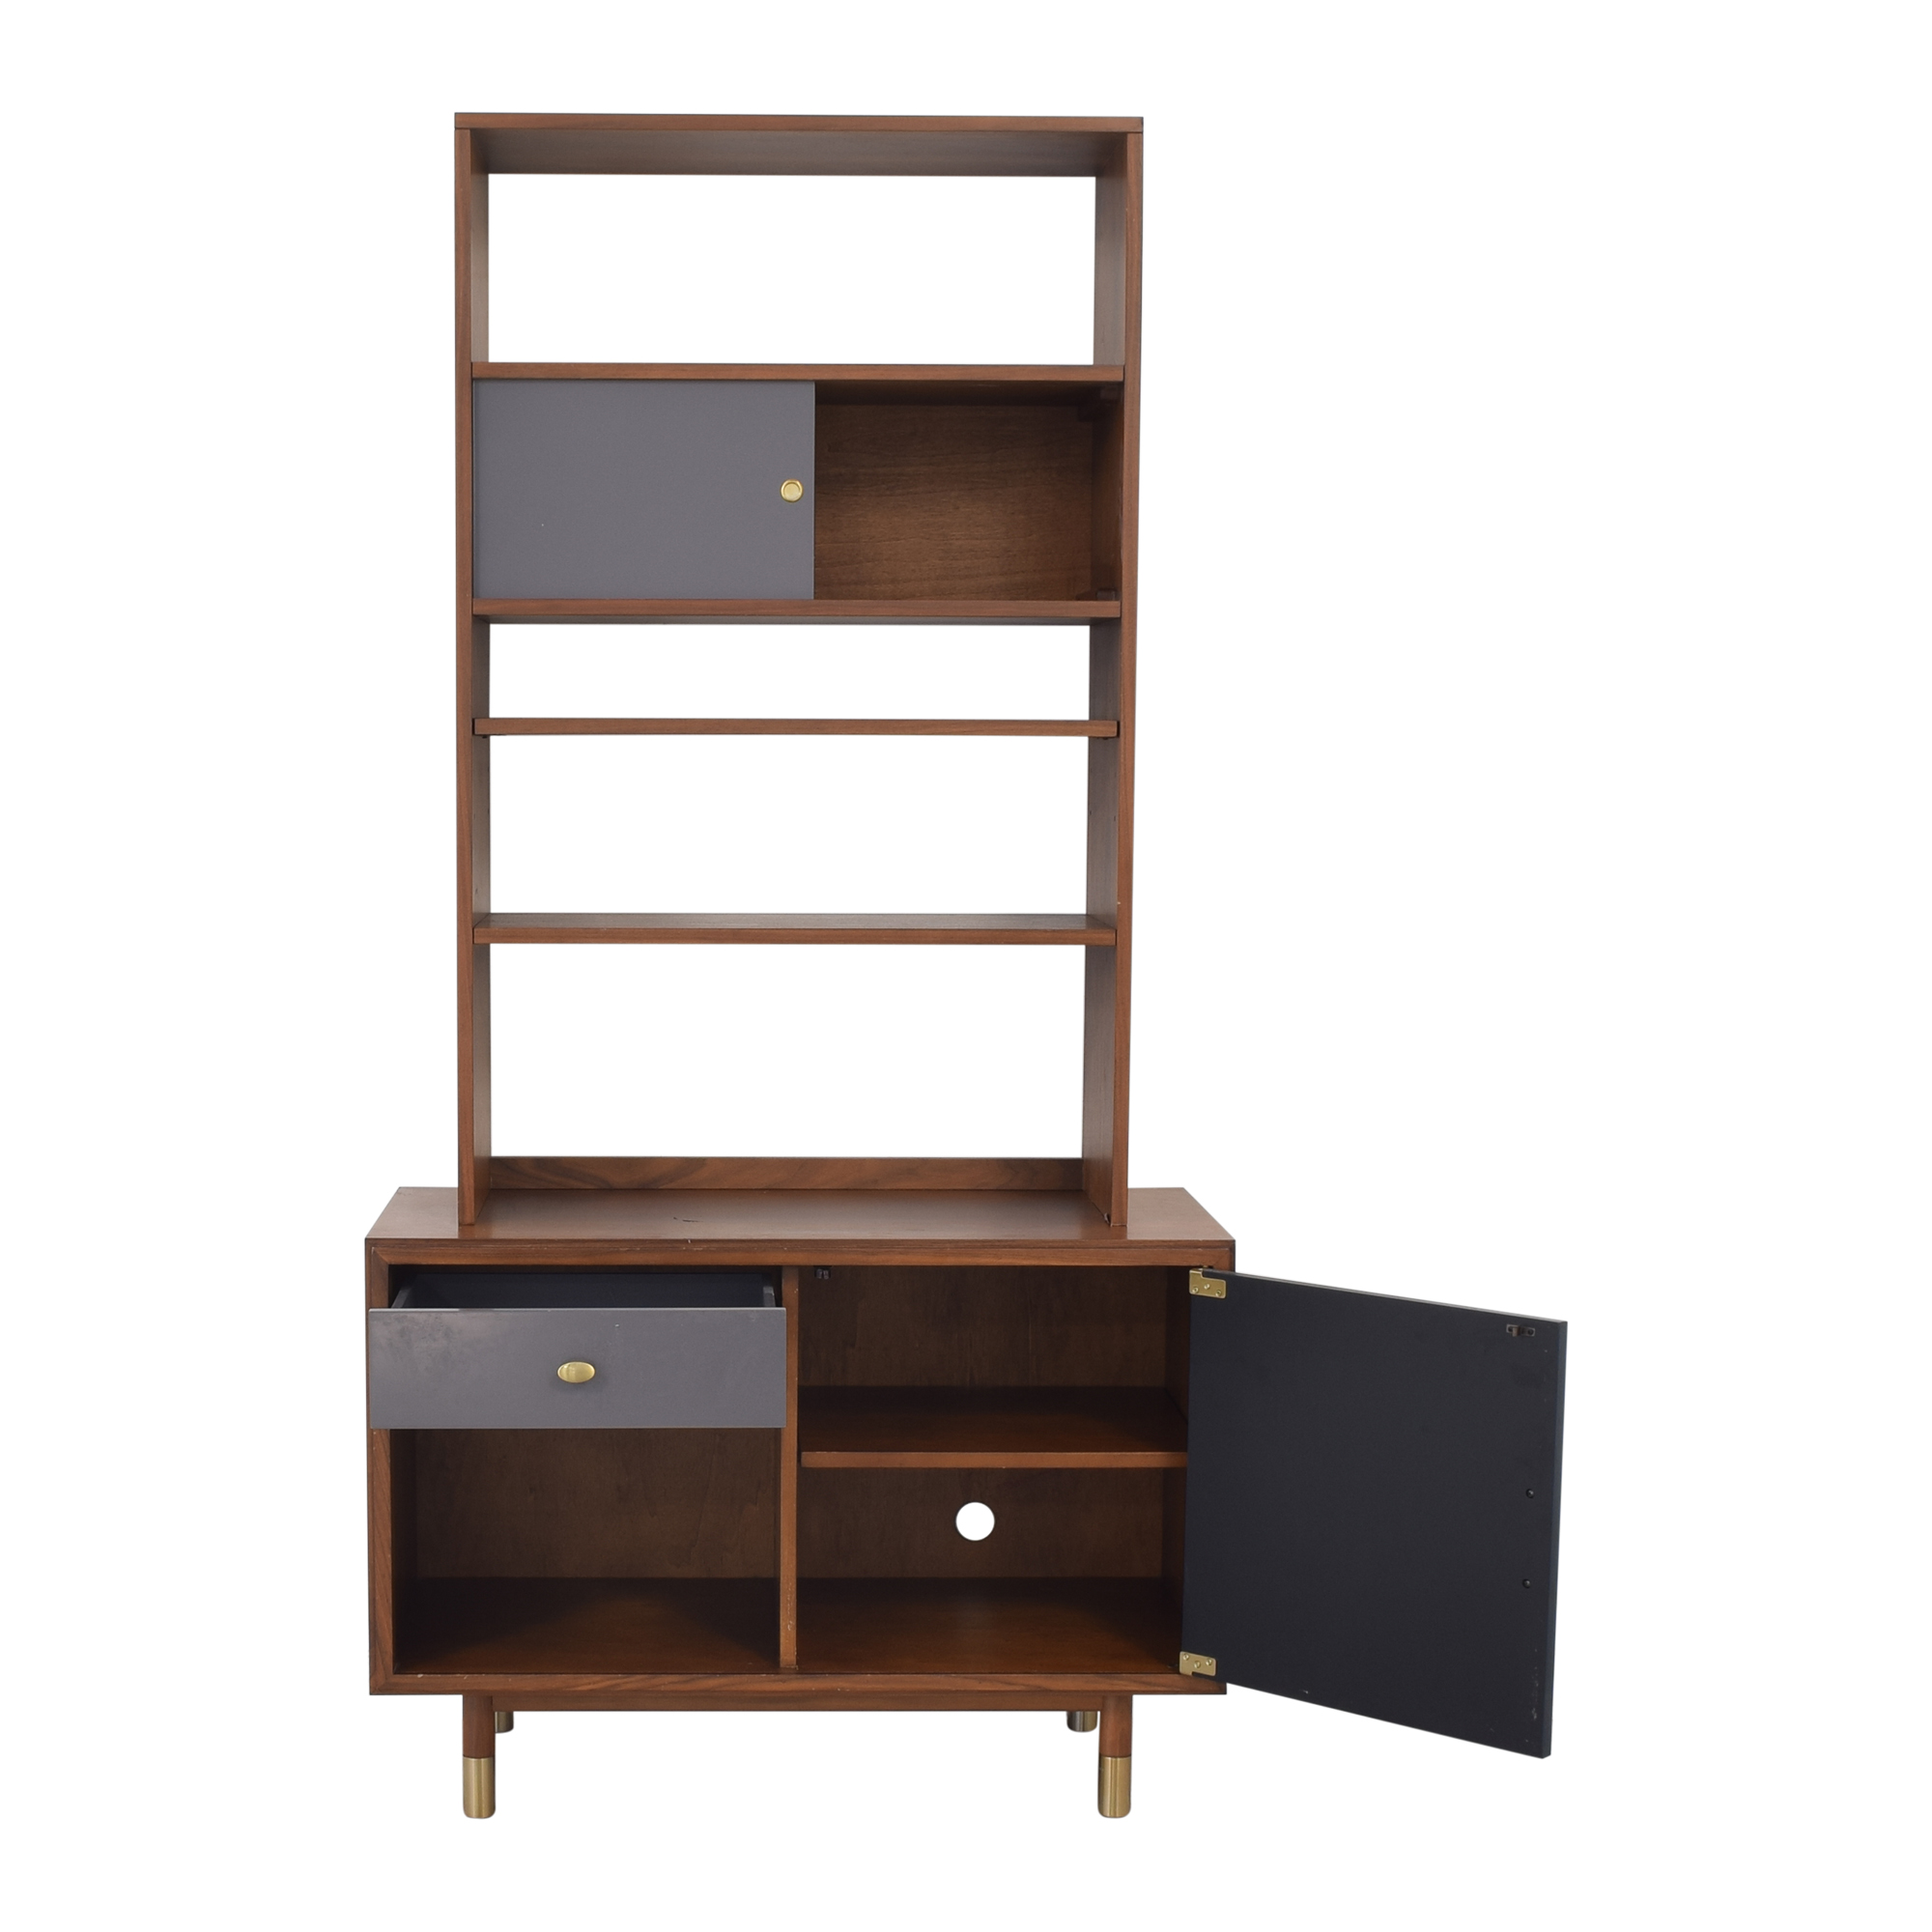 shop DwellStudios for Magnussen Pace Etagere DwellStudio Bookcases & Shelving